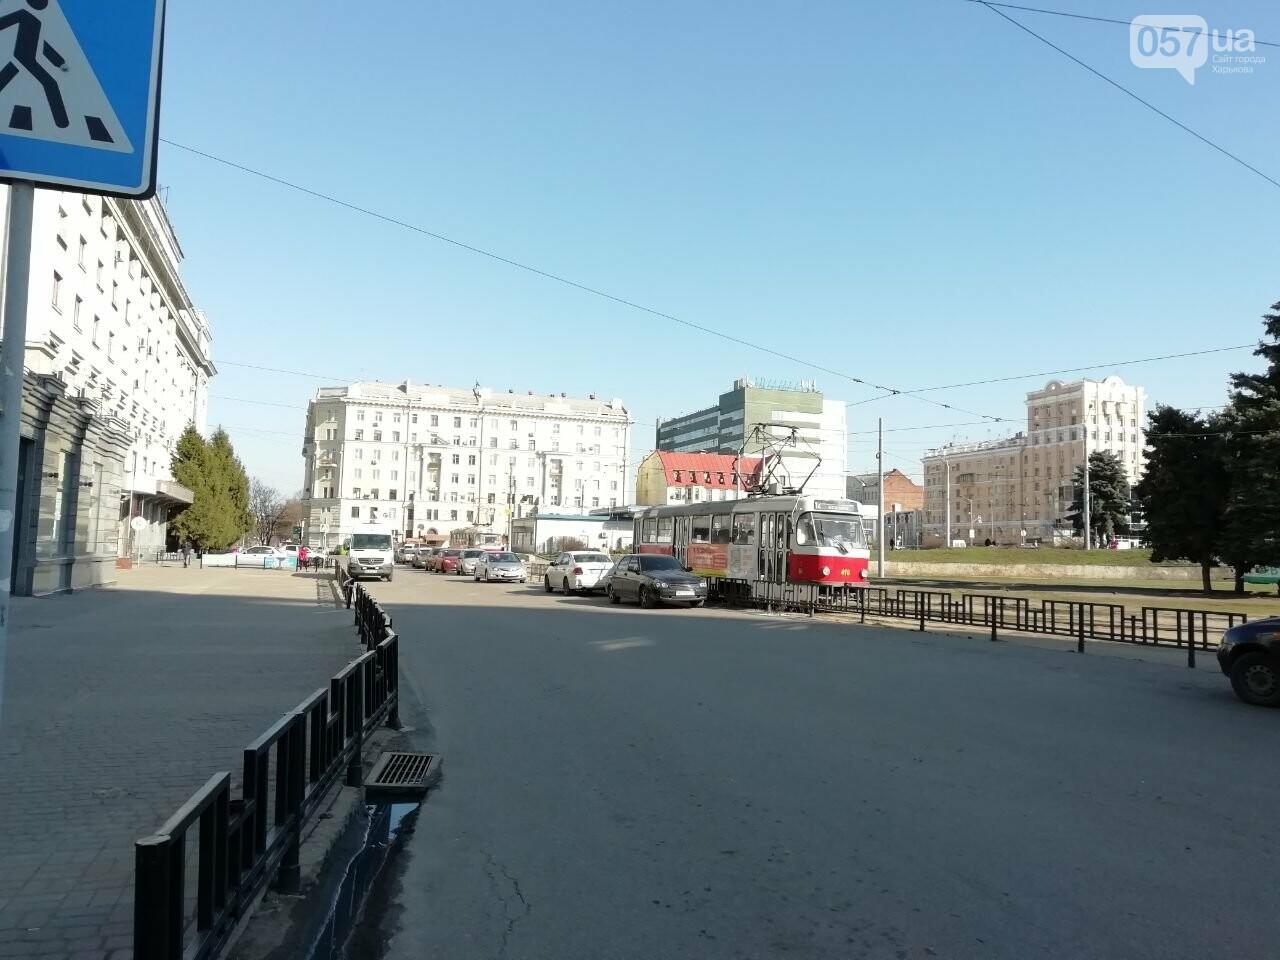 Безлюдный вокзал и дезинфекция трамваев: как живет ЮЖД во время карантина, - ФОТО, фото-18